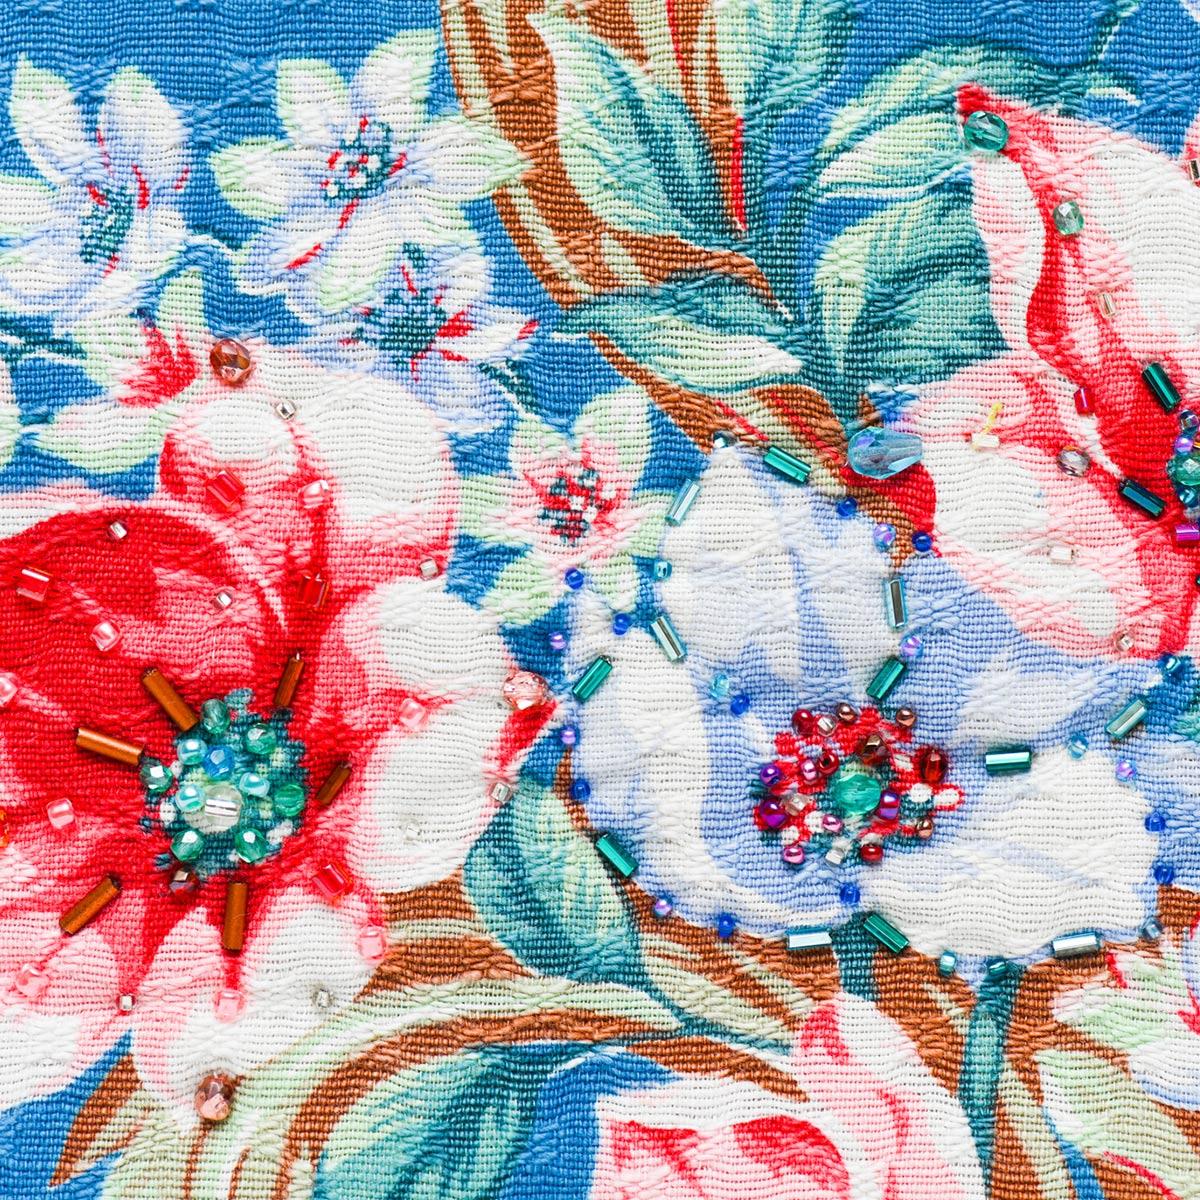 handbeaded clutch floral motif on blue